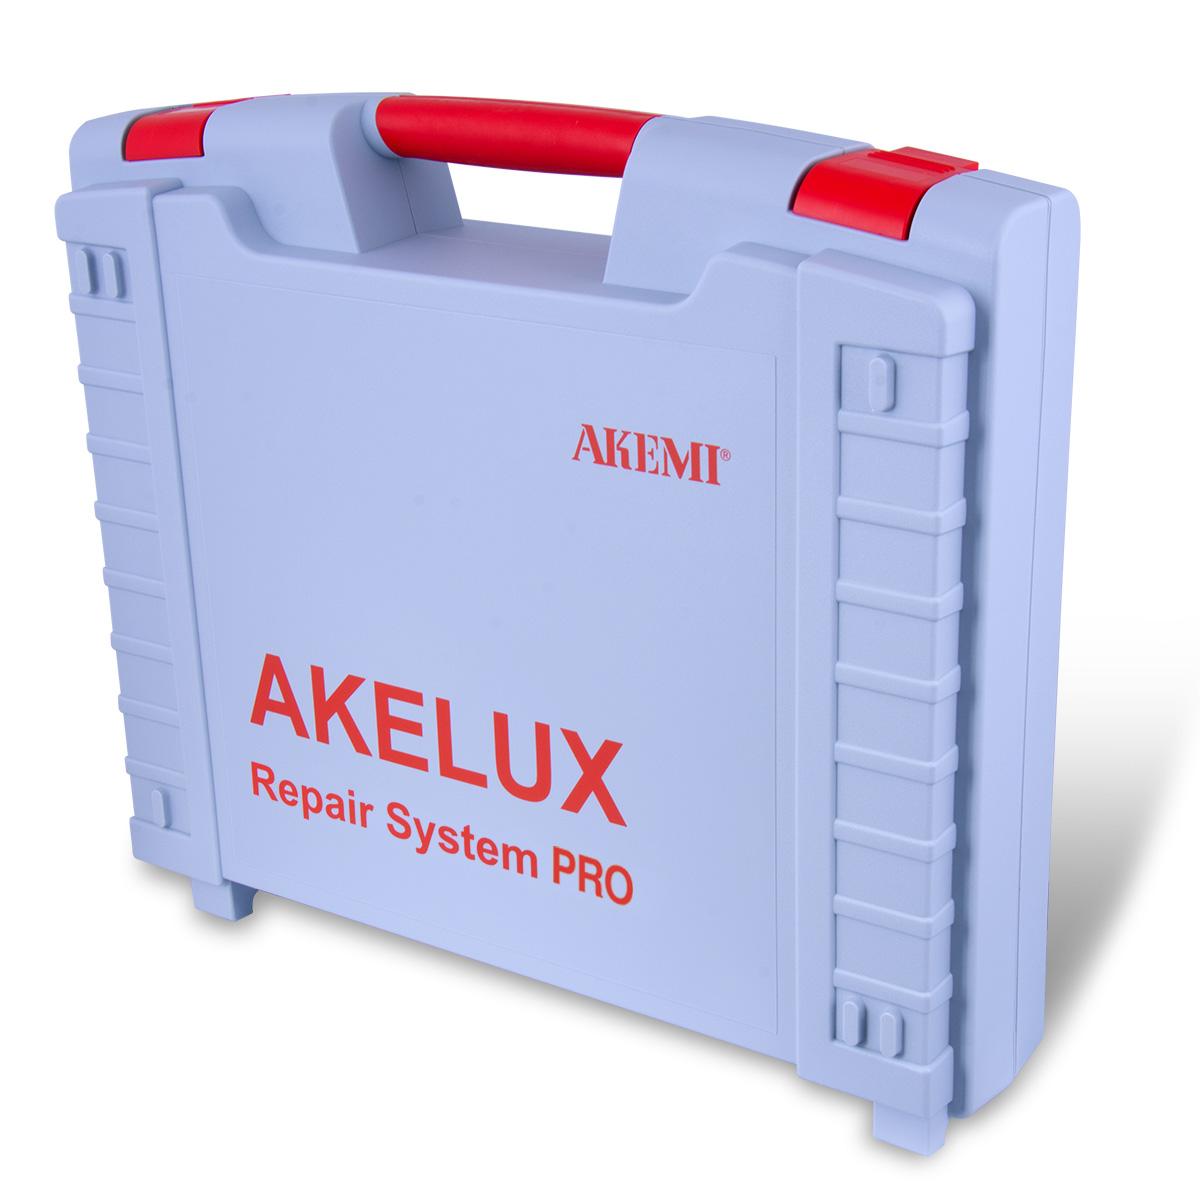 AKELUX Repair System PRO